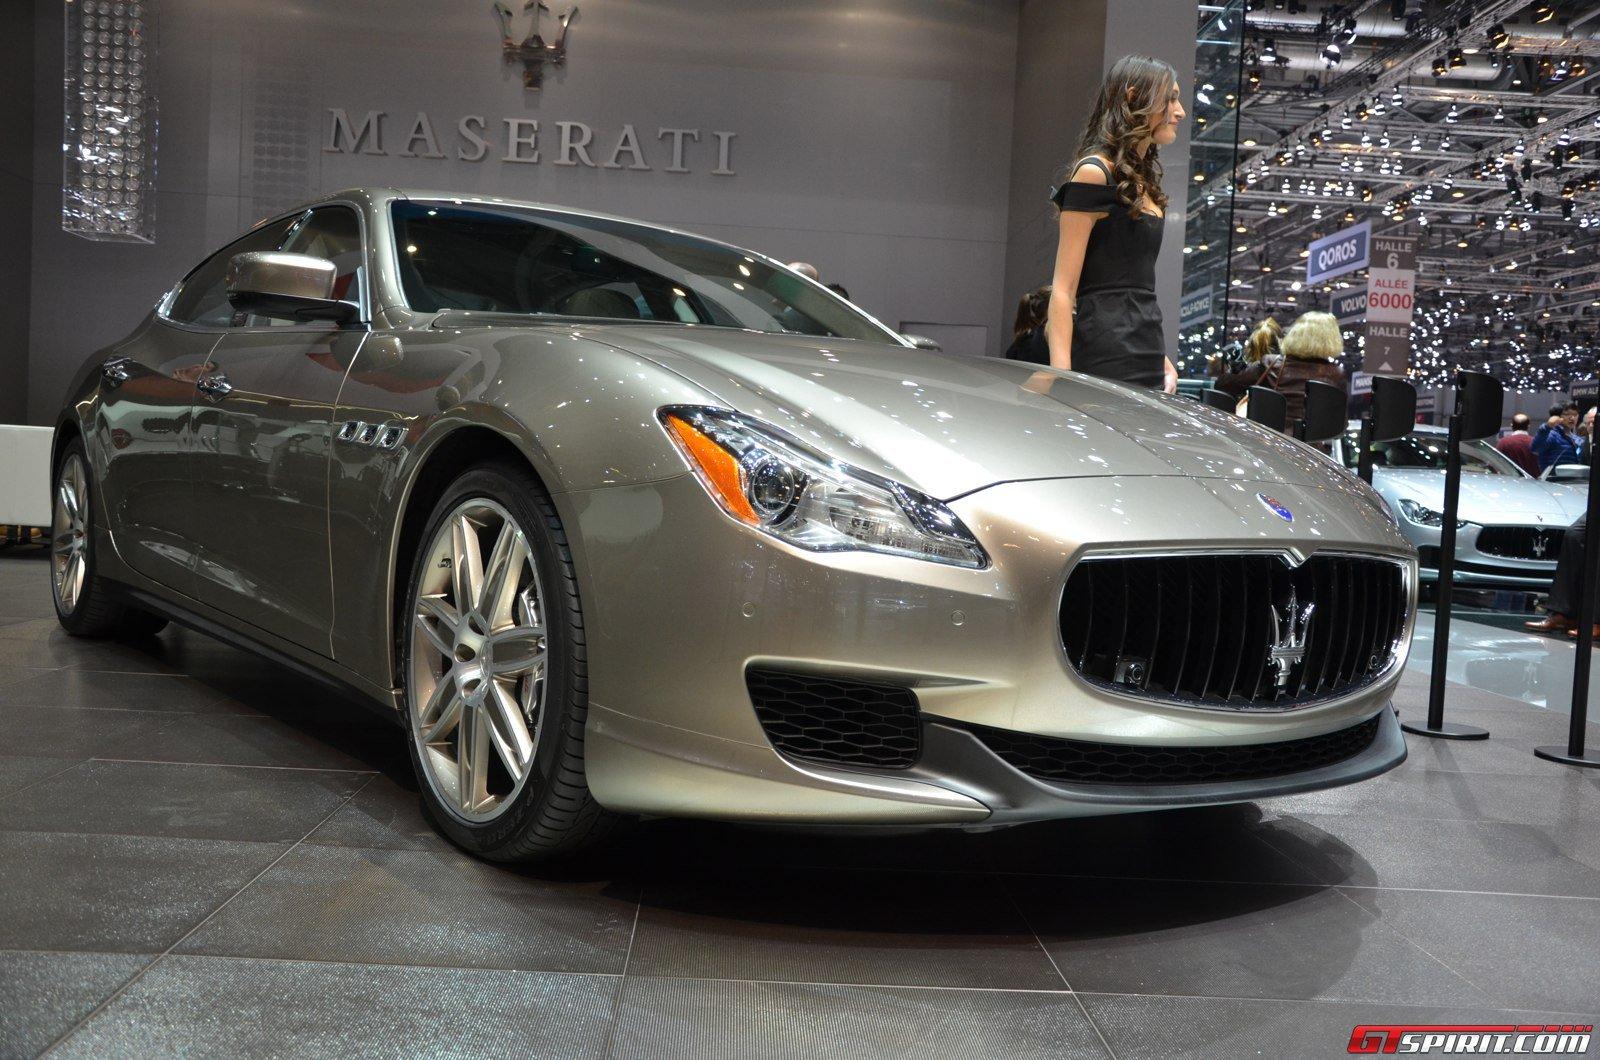 Geneva 2014: Maserati Quattroporte Ermenegildo Zegna - GTspirit